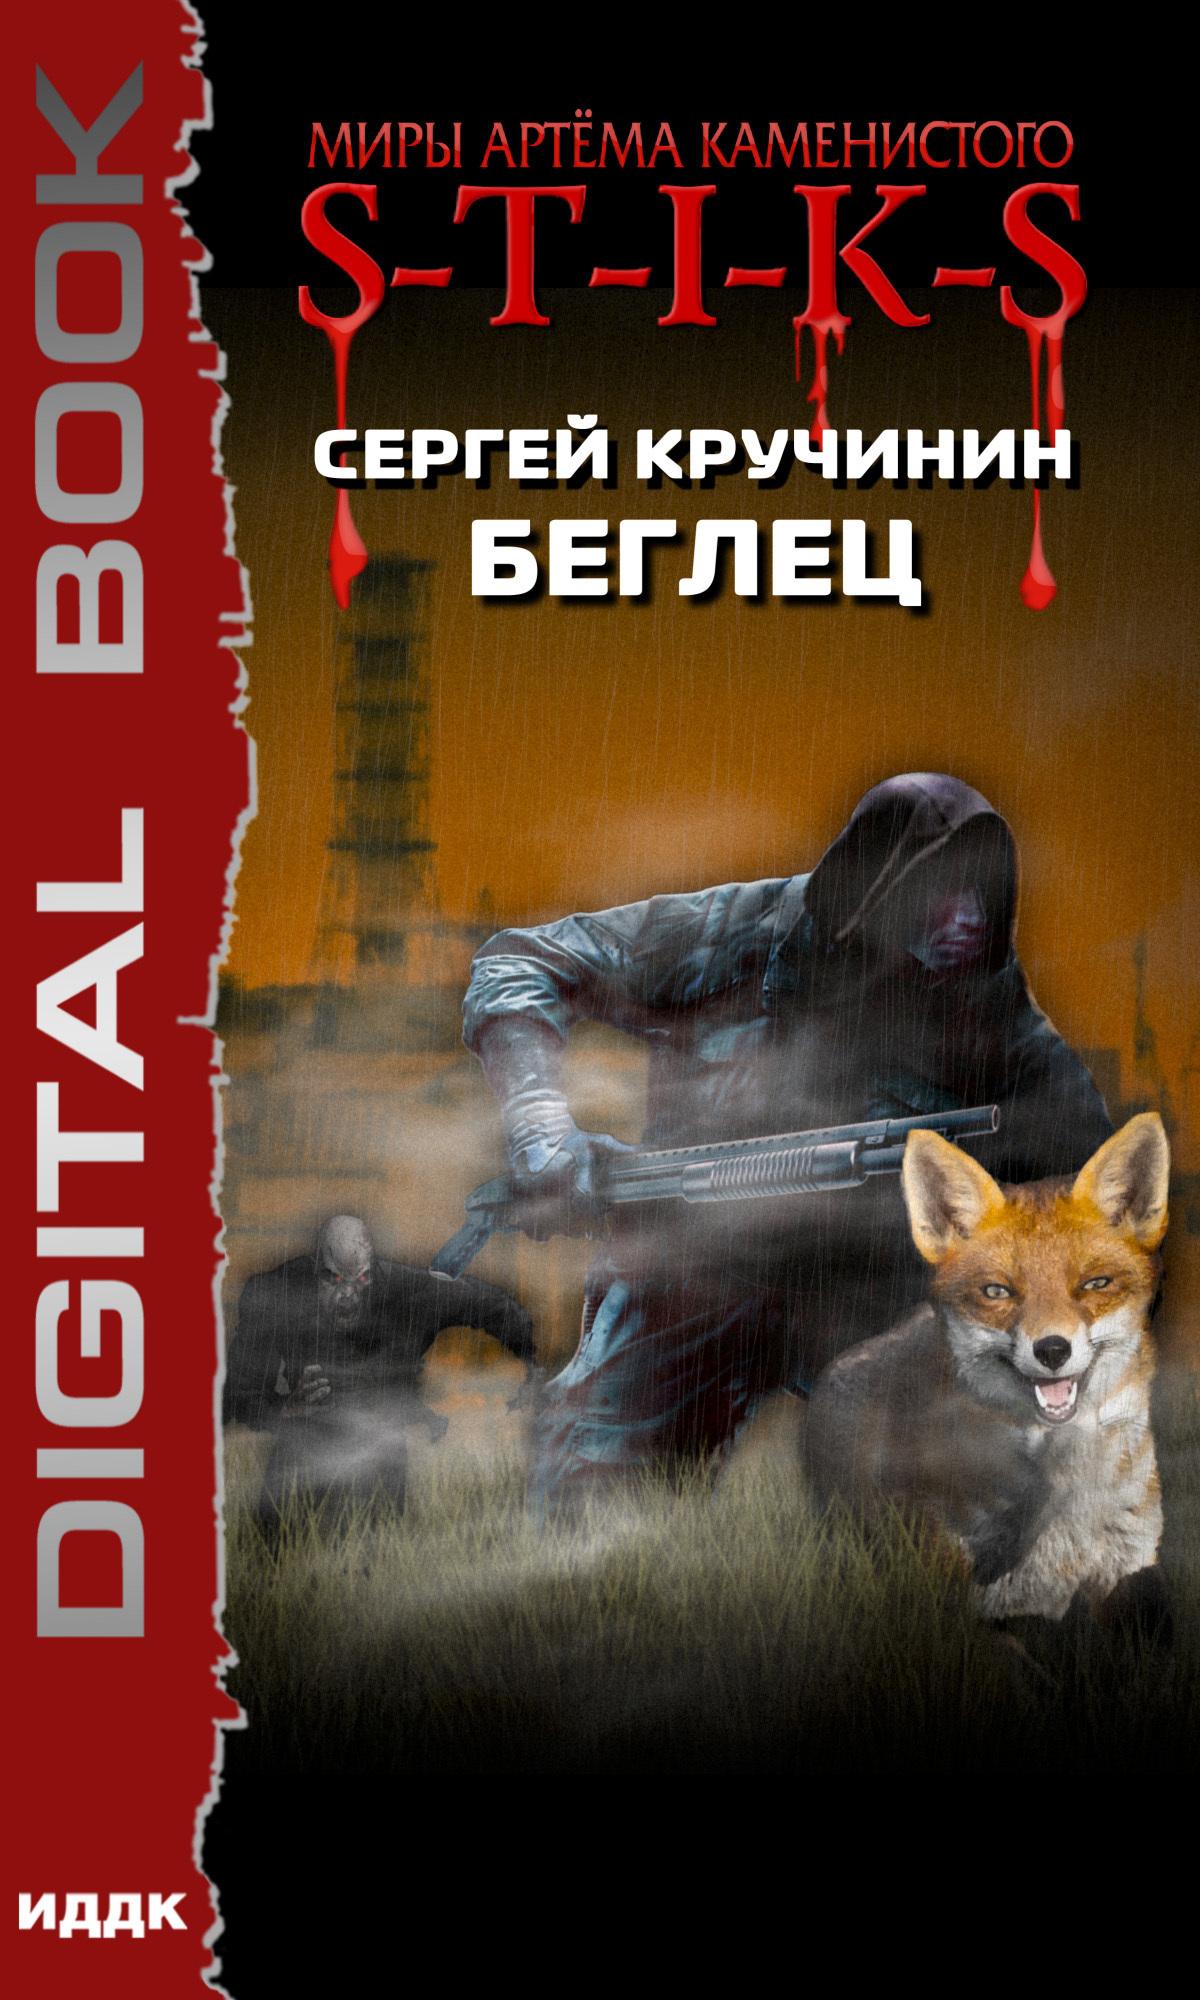 Сергей Кручинин - Беглец